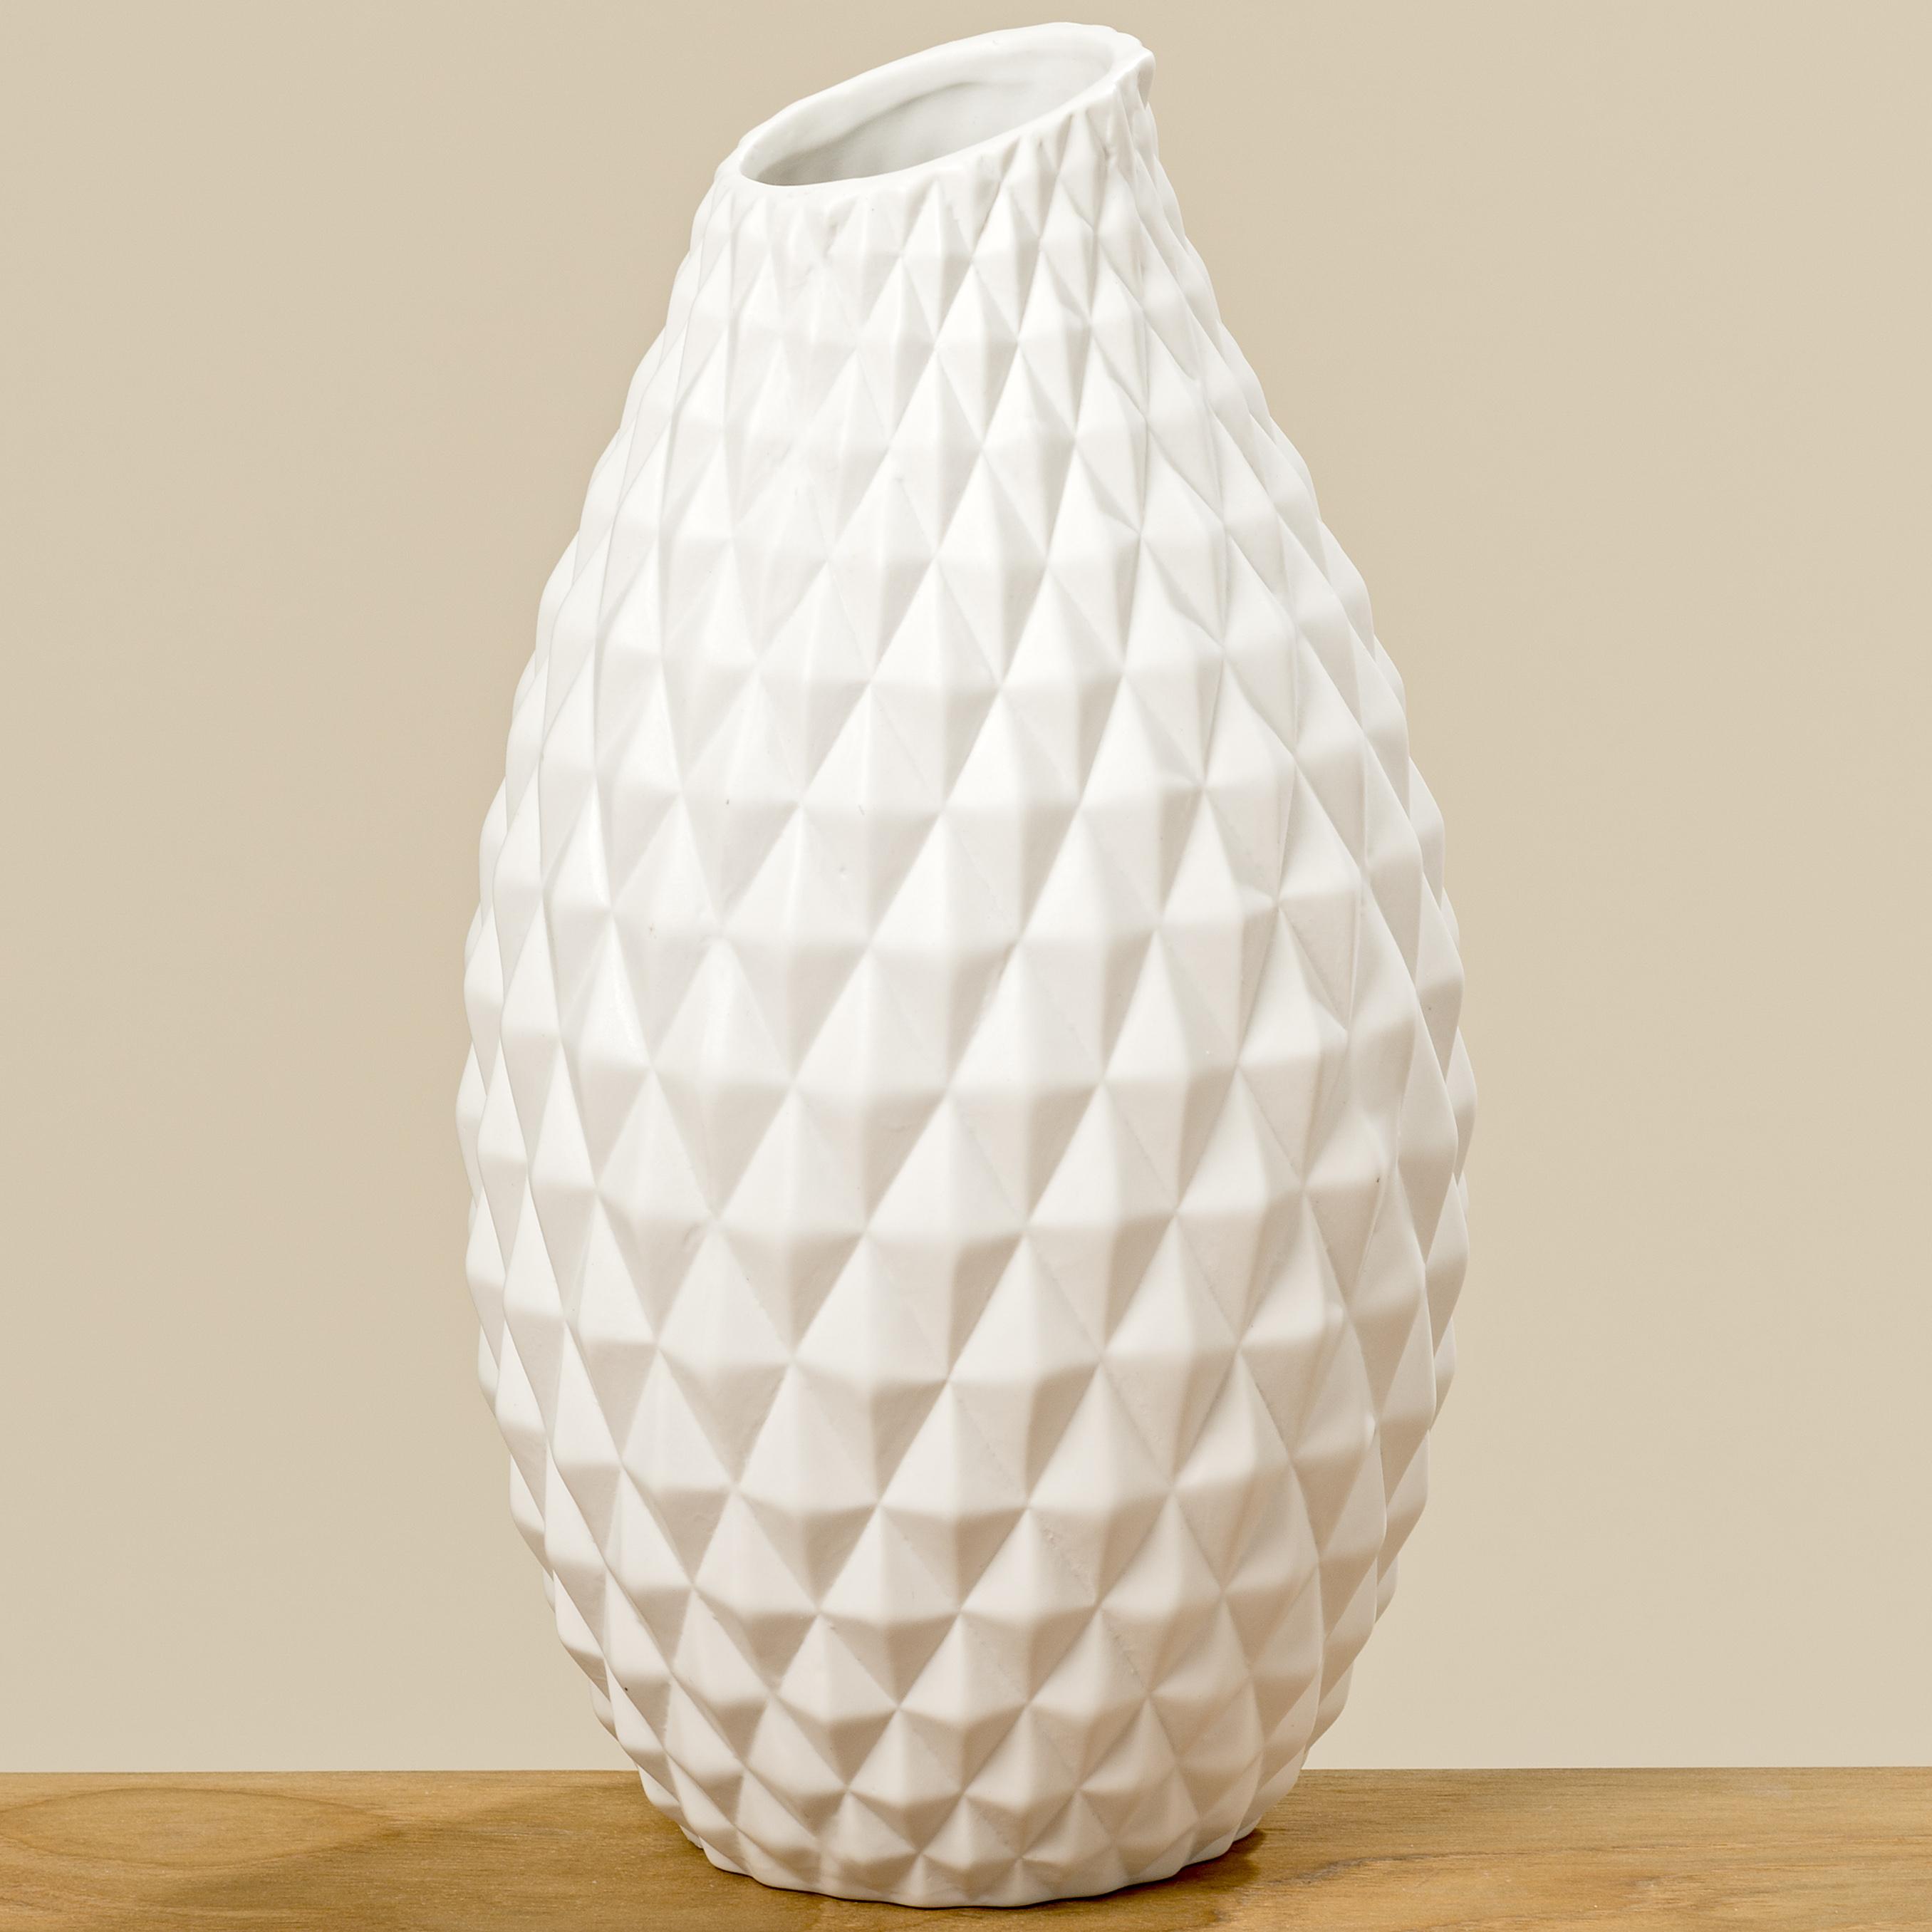 Vase Agnes Weiß Keramik Blumenvase 30 Cm Groß Deko Design Klassik